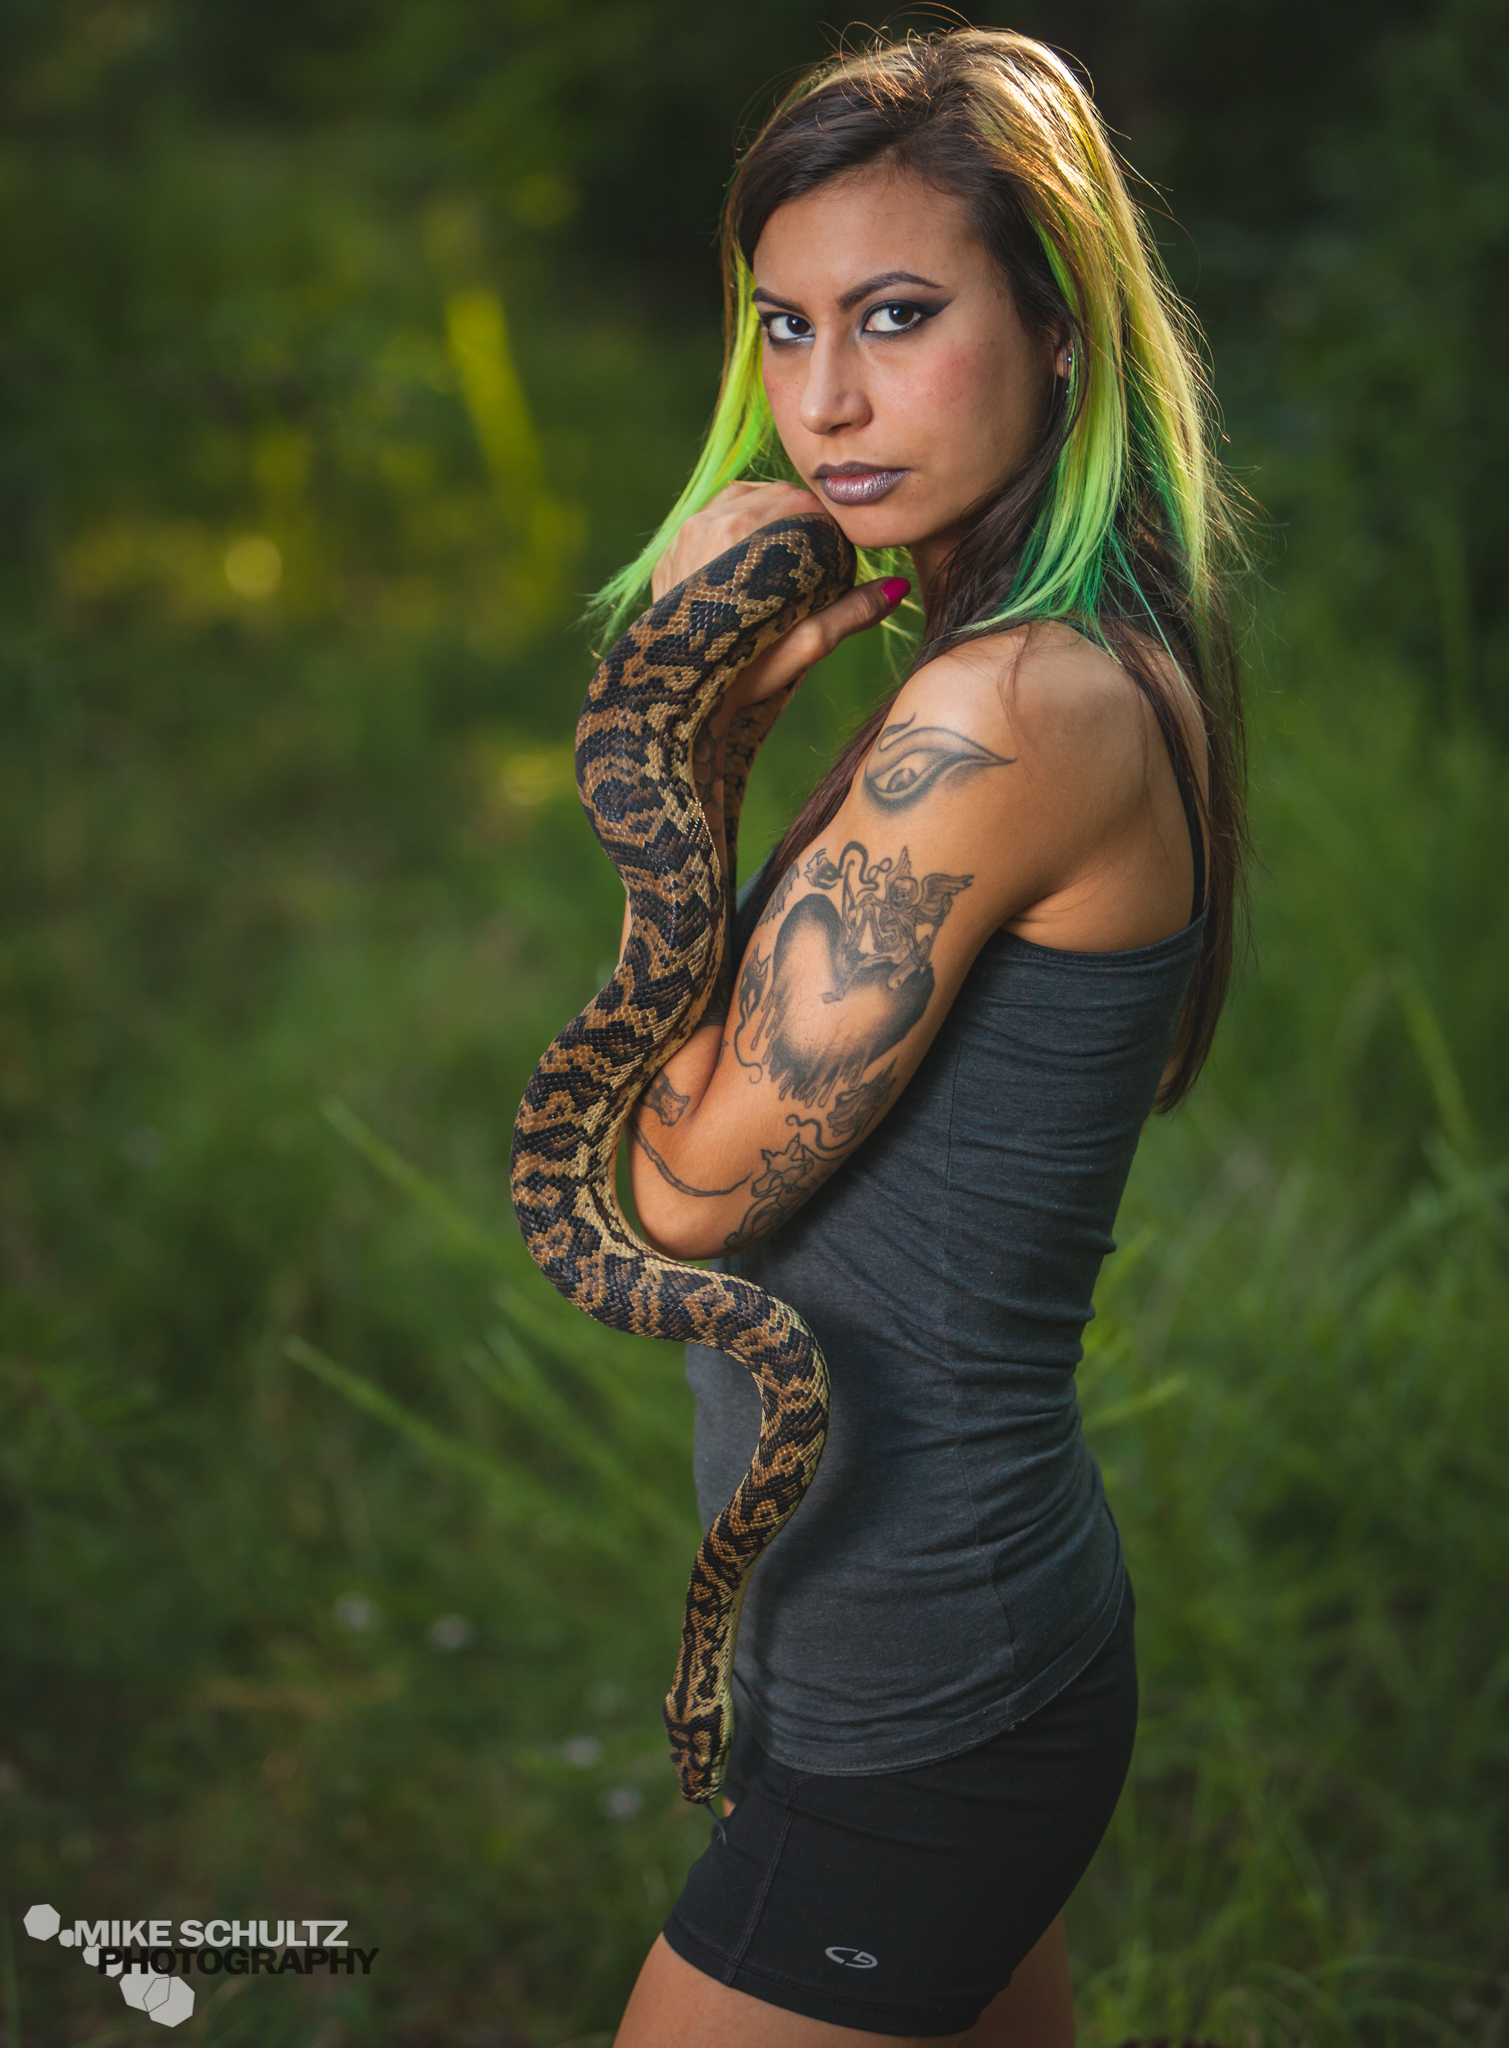 Portrait Lens for Reptile Photography